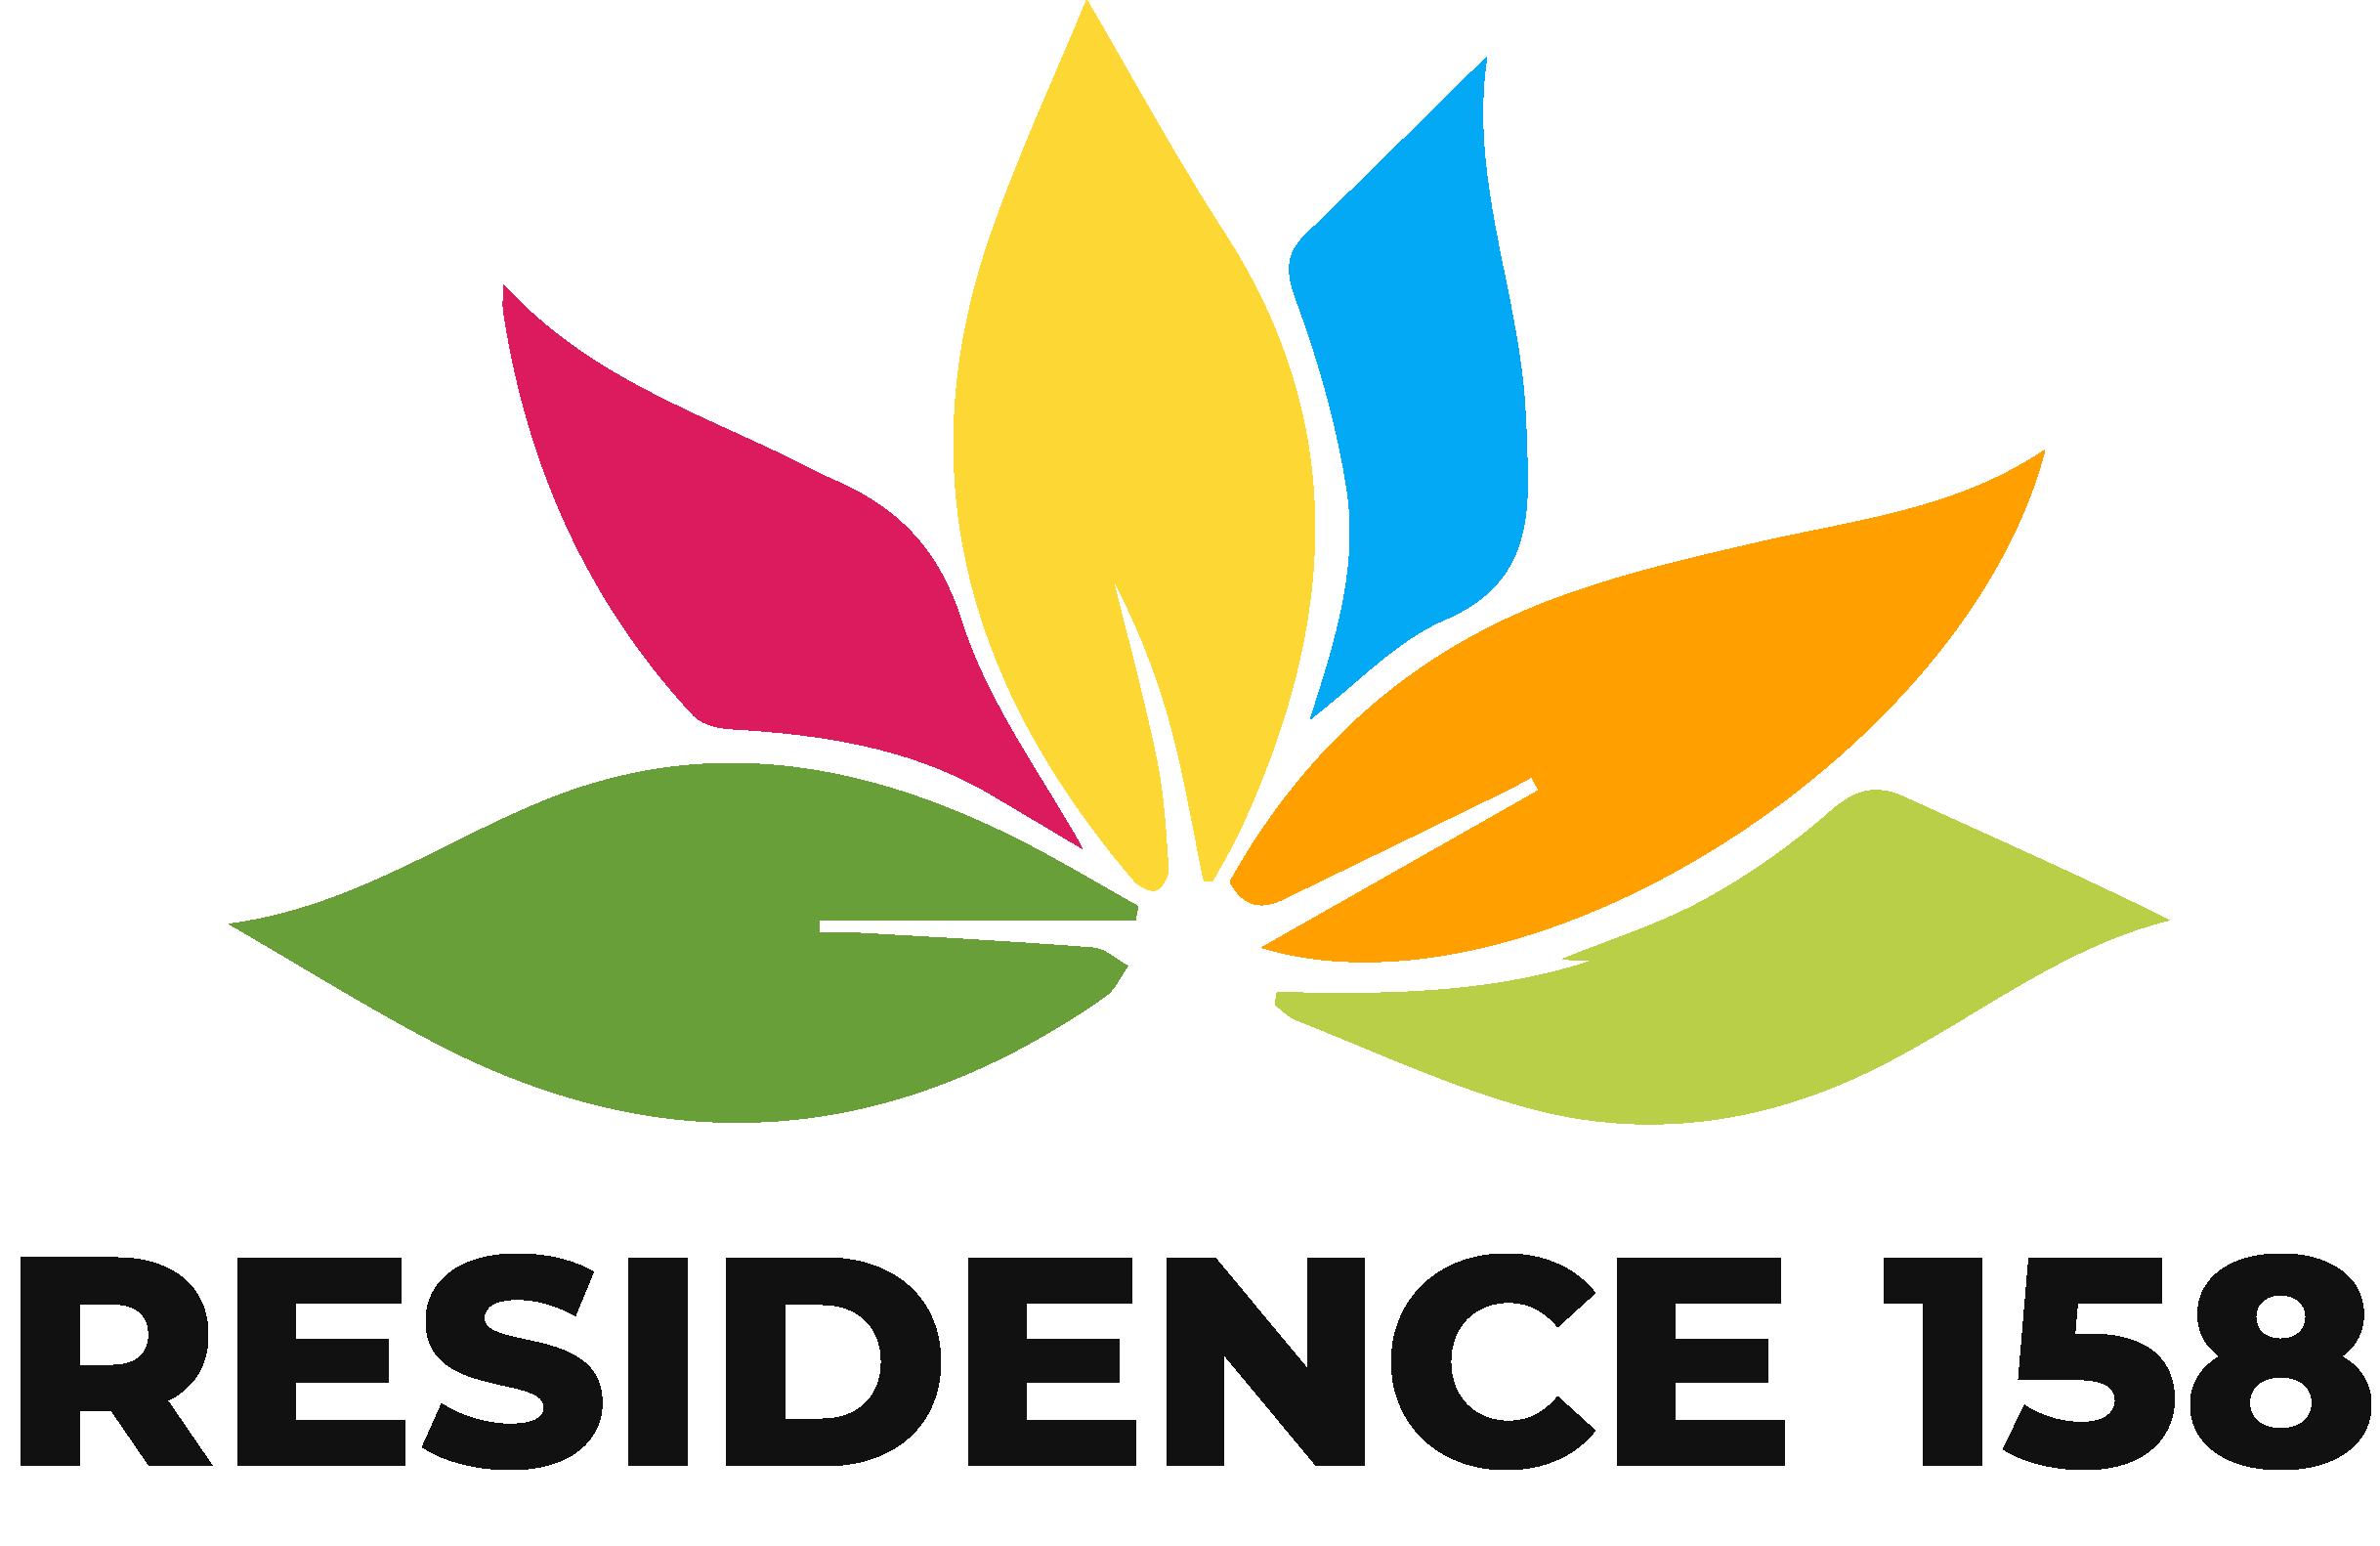 www.residence158.ro